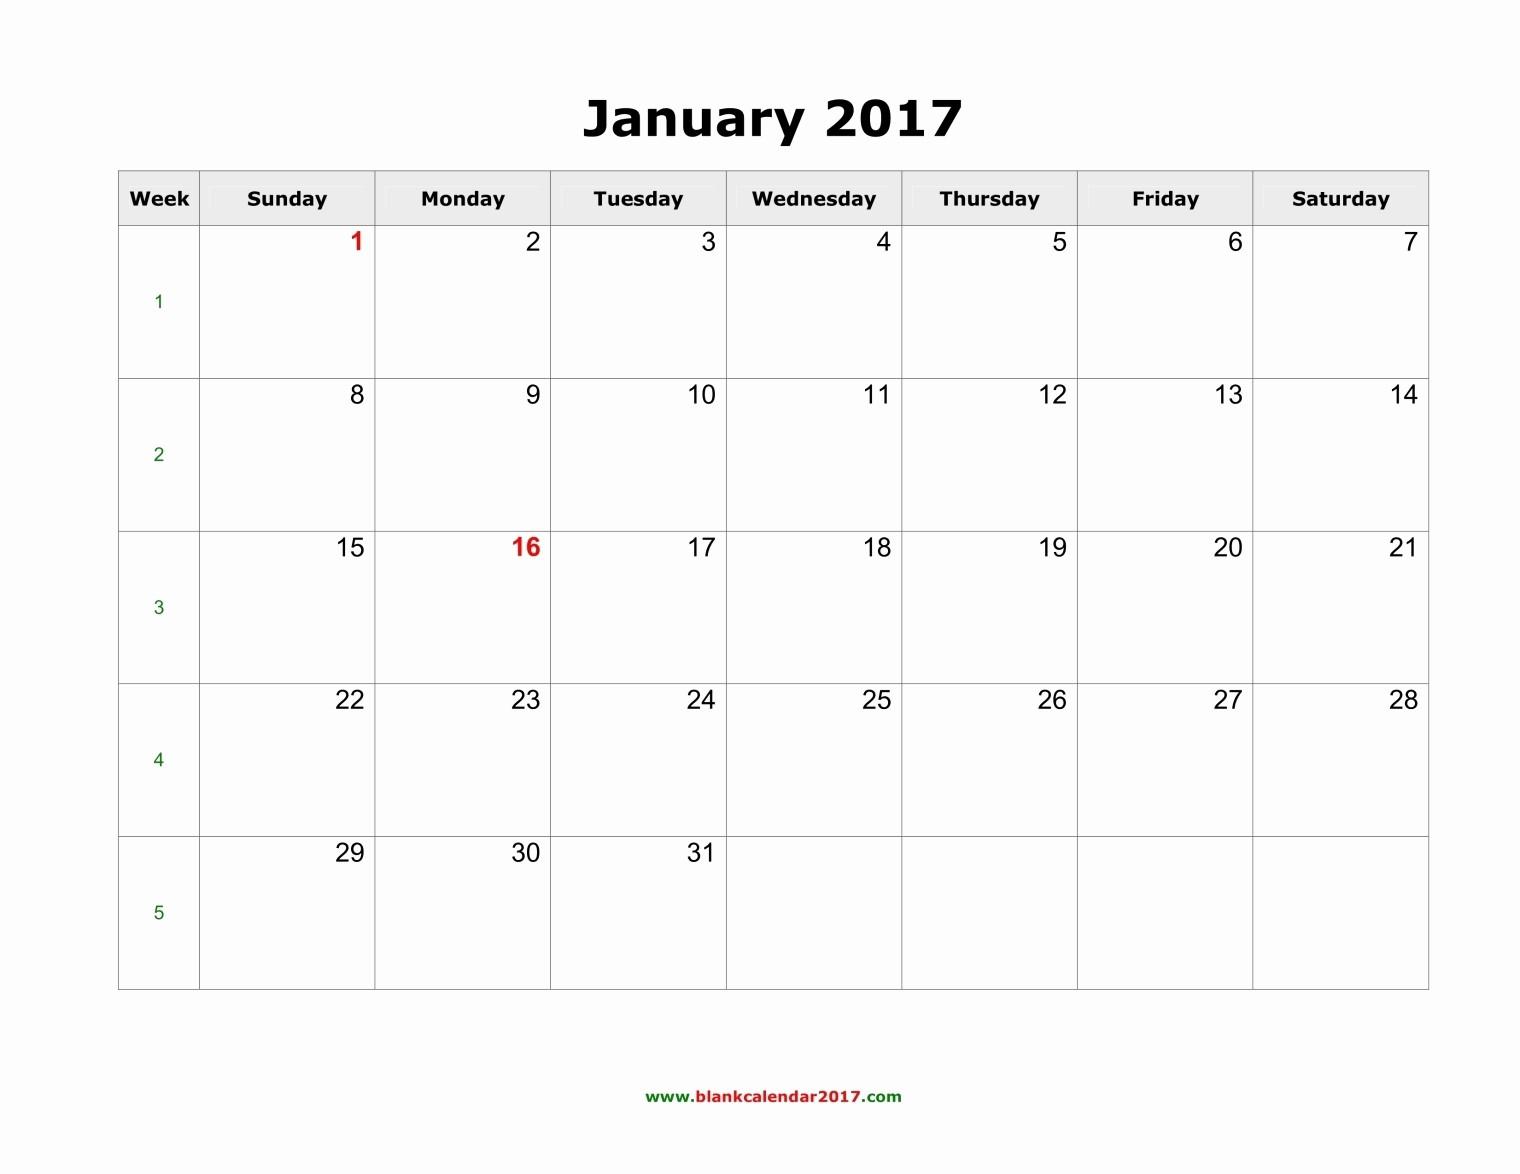 2017 Calendar Template Word Document Beautiful May 2017 Calendar Word